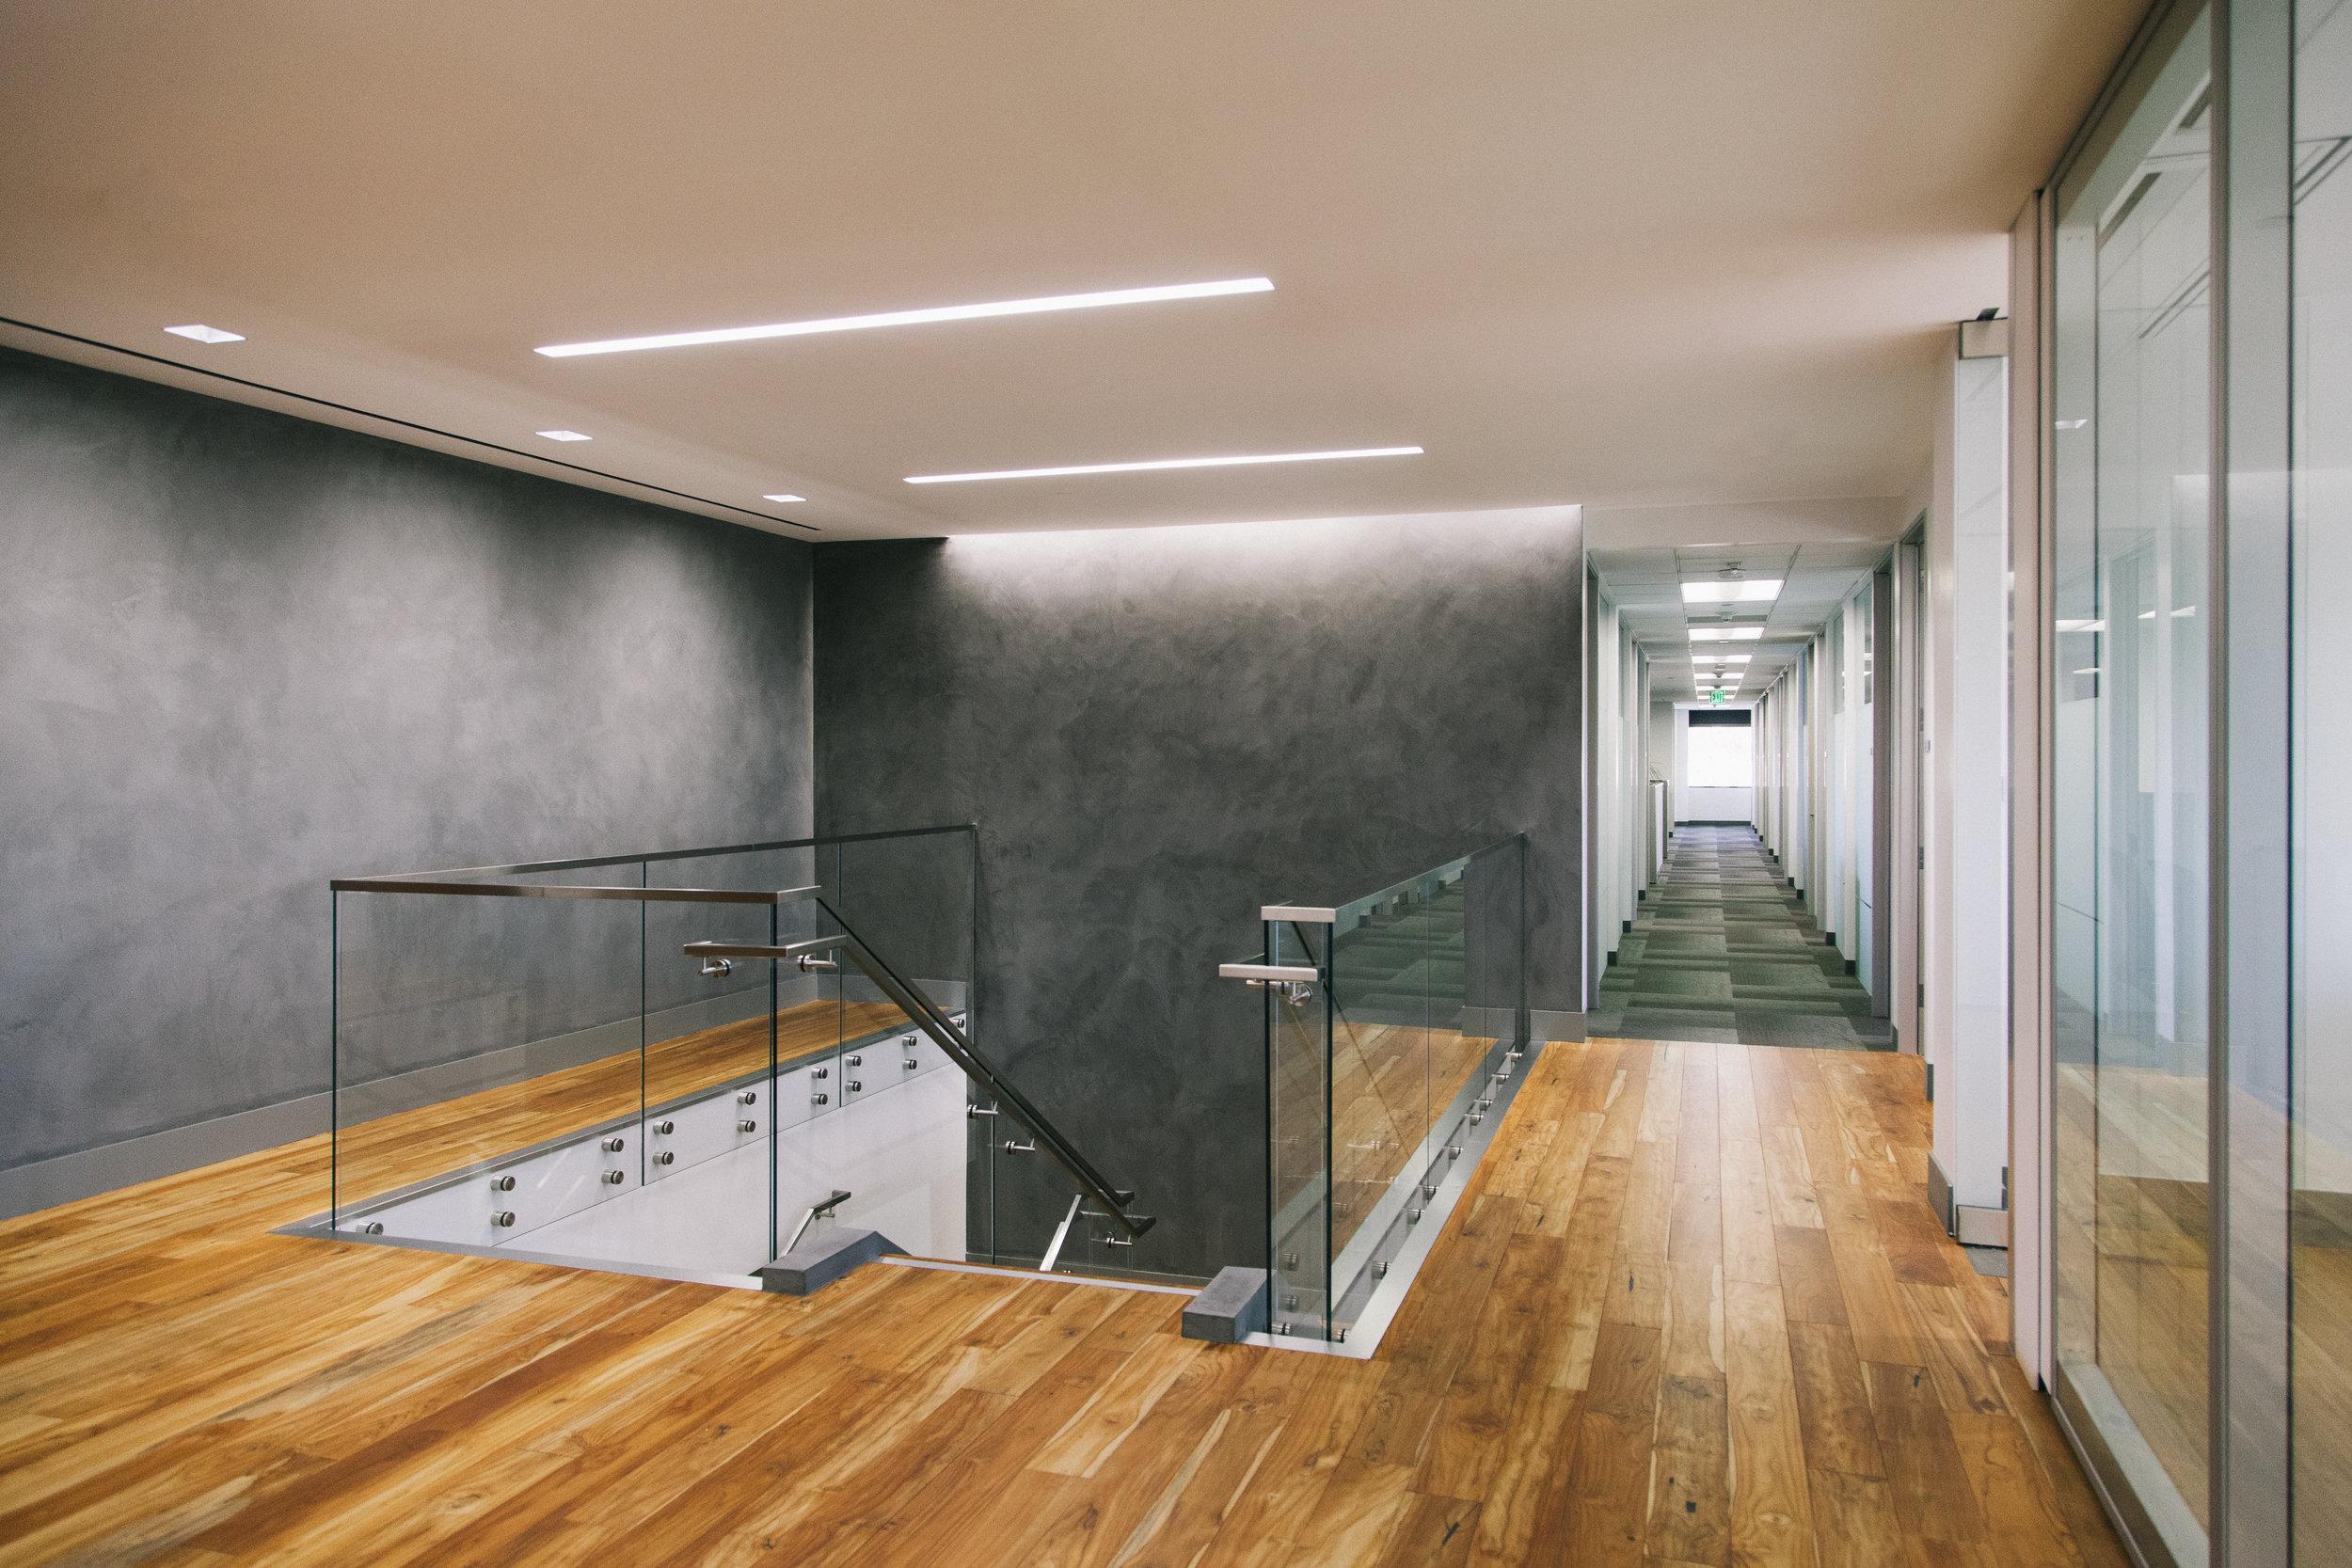 S.E.A.-Studio-Environmental-Architecture-David-Hertz-FAIA-First-Pacific-Advisors-Los-Angeles-tenant-improvement-sustainable-regenerative-restorative-green-design-office-sleek-modern-interior-Westside-commercial-building-professional-workplace-6.jpg